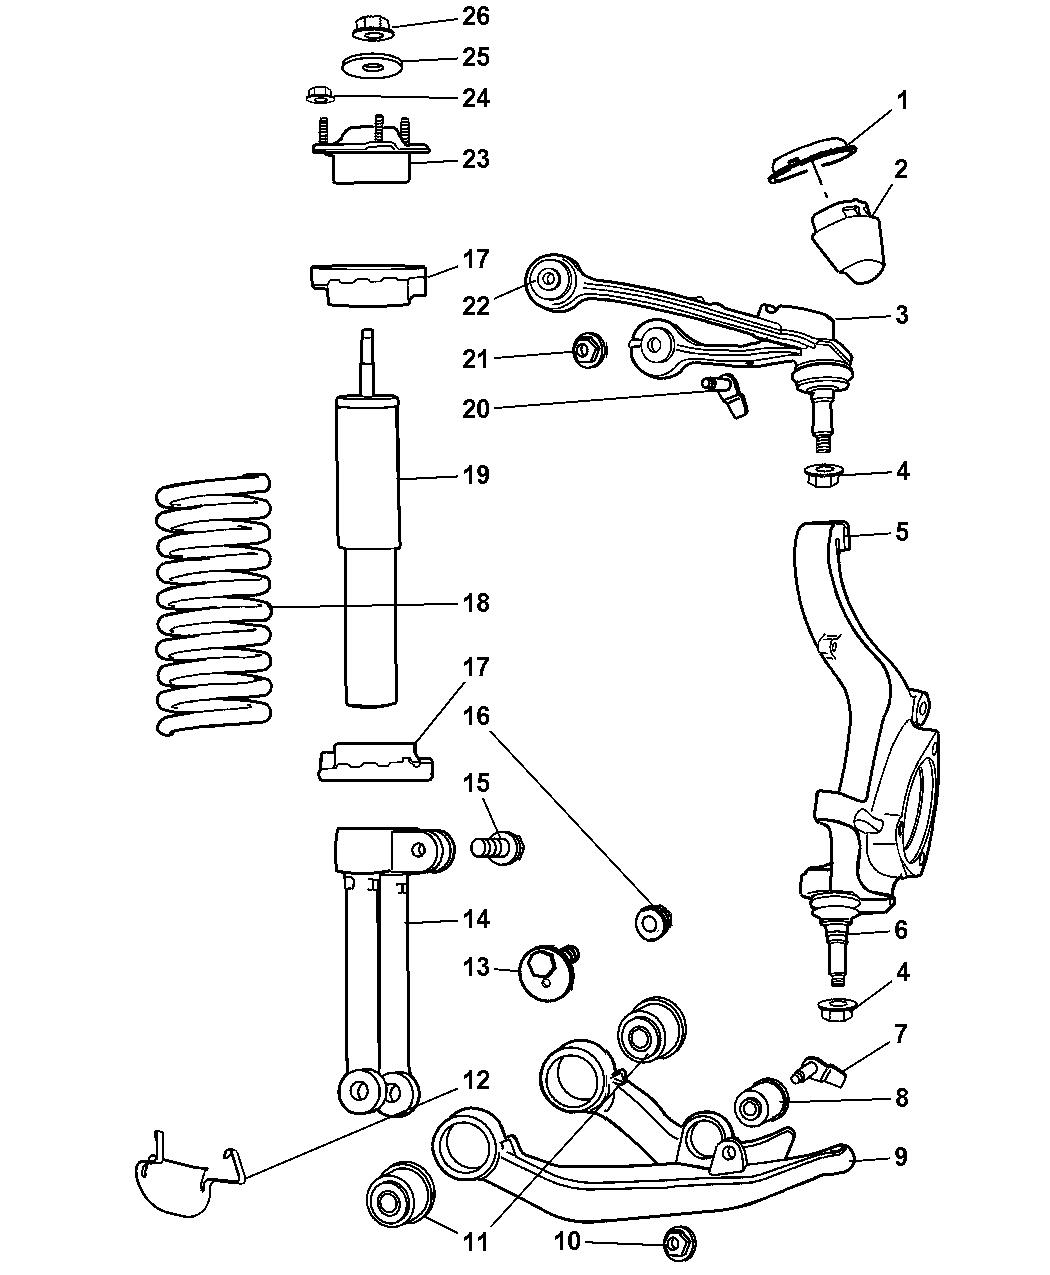 2005 Jeep Liberty Suspension